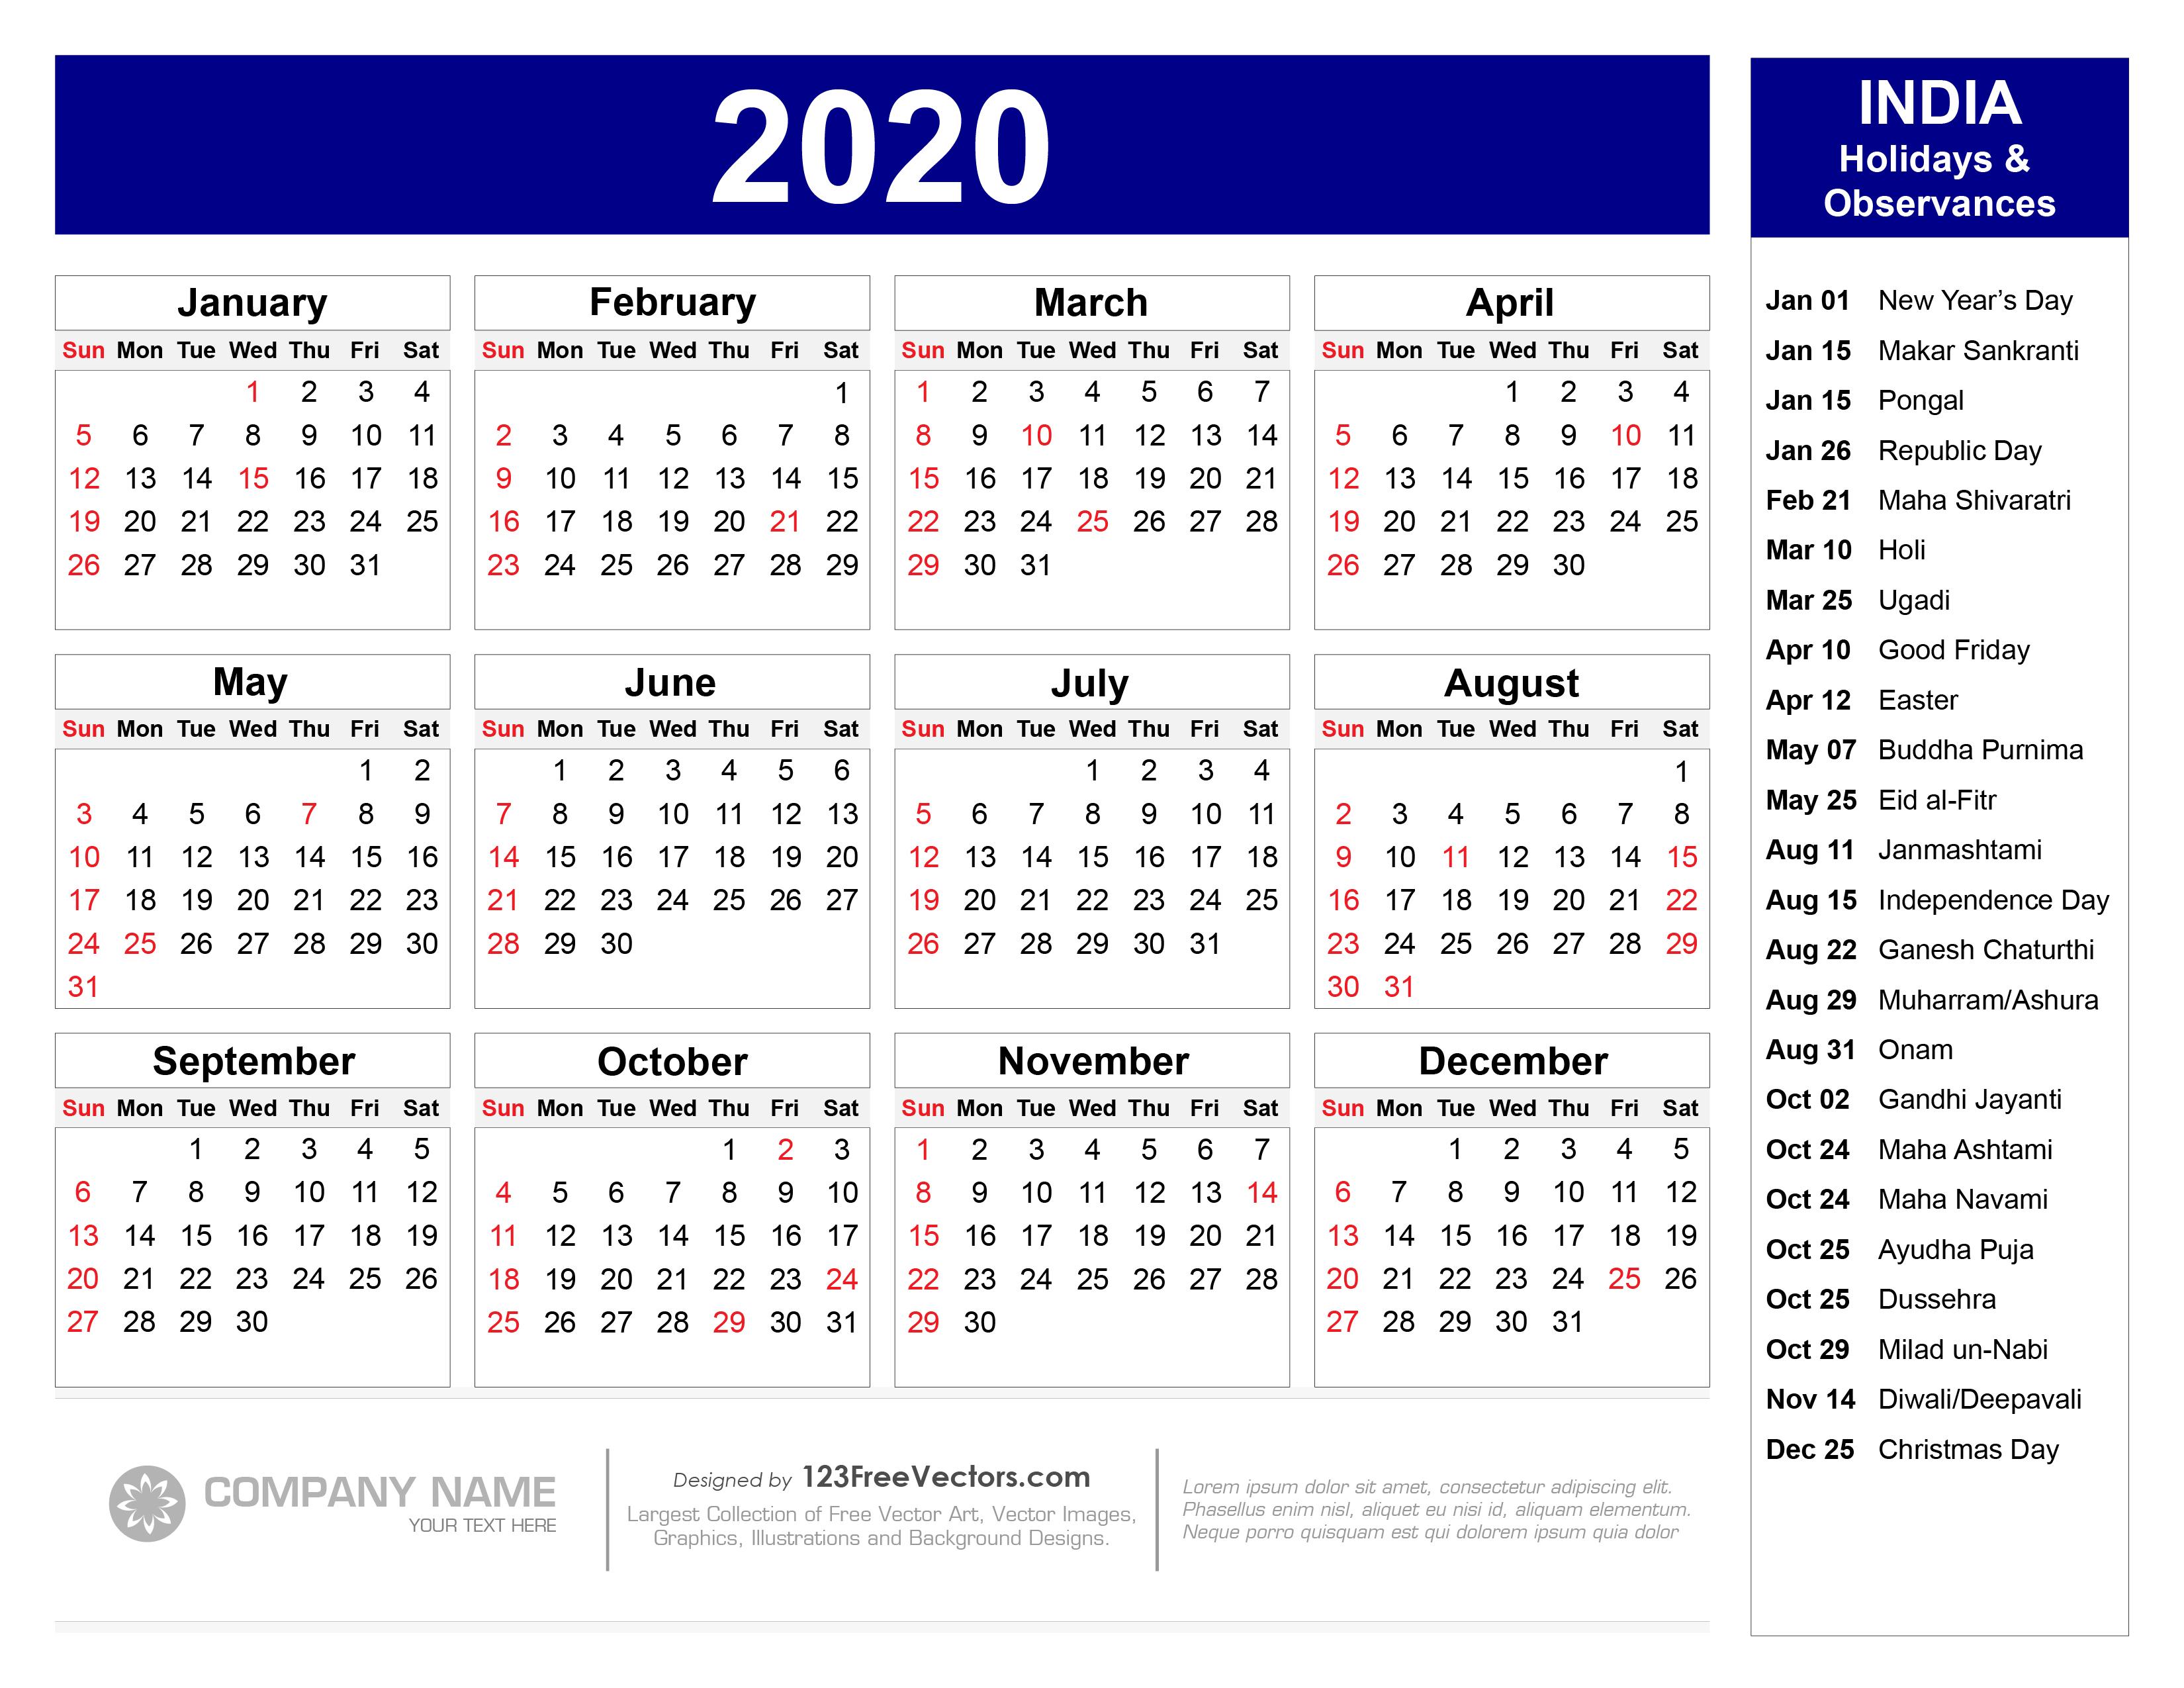 2020 Calendar With Indian Holidays Pdf